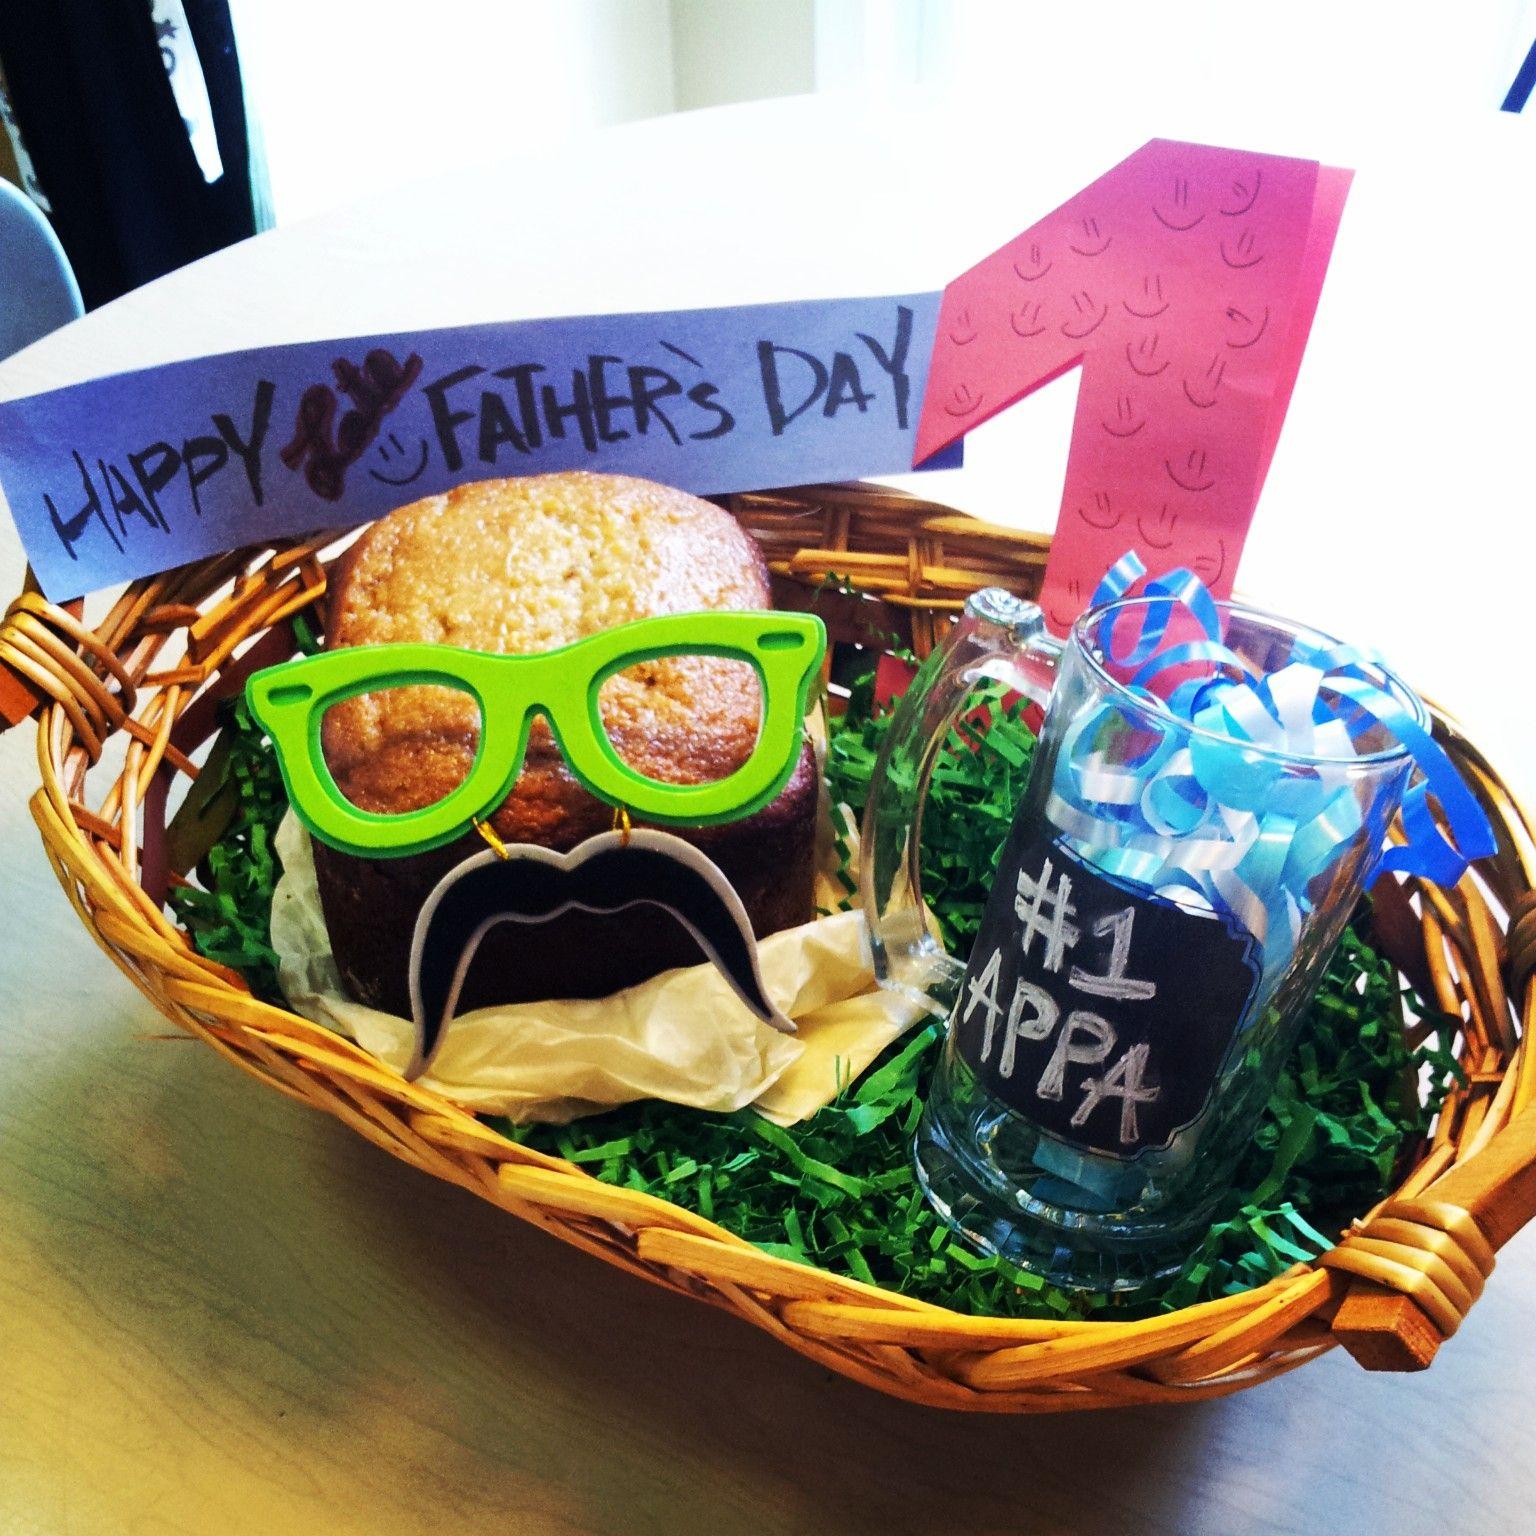 Fathers day goodie basket banana bread chalk beer mug